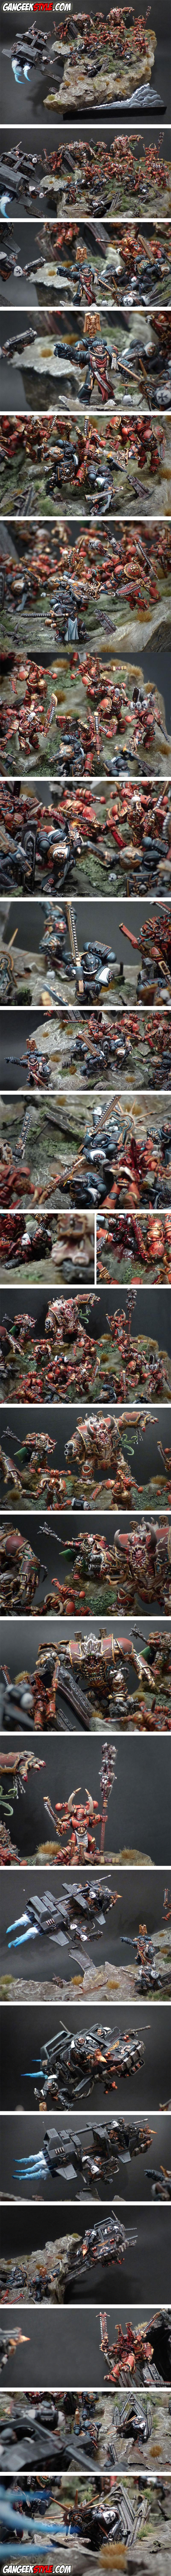 Battle, Berserk, Black Templars, Khorne, Object Source Lighting, Warhammer 40 000